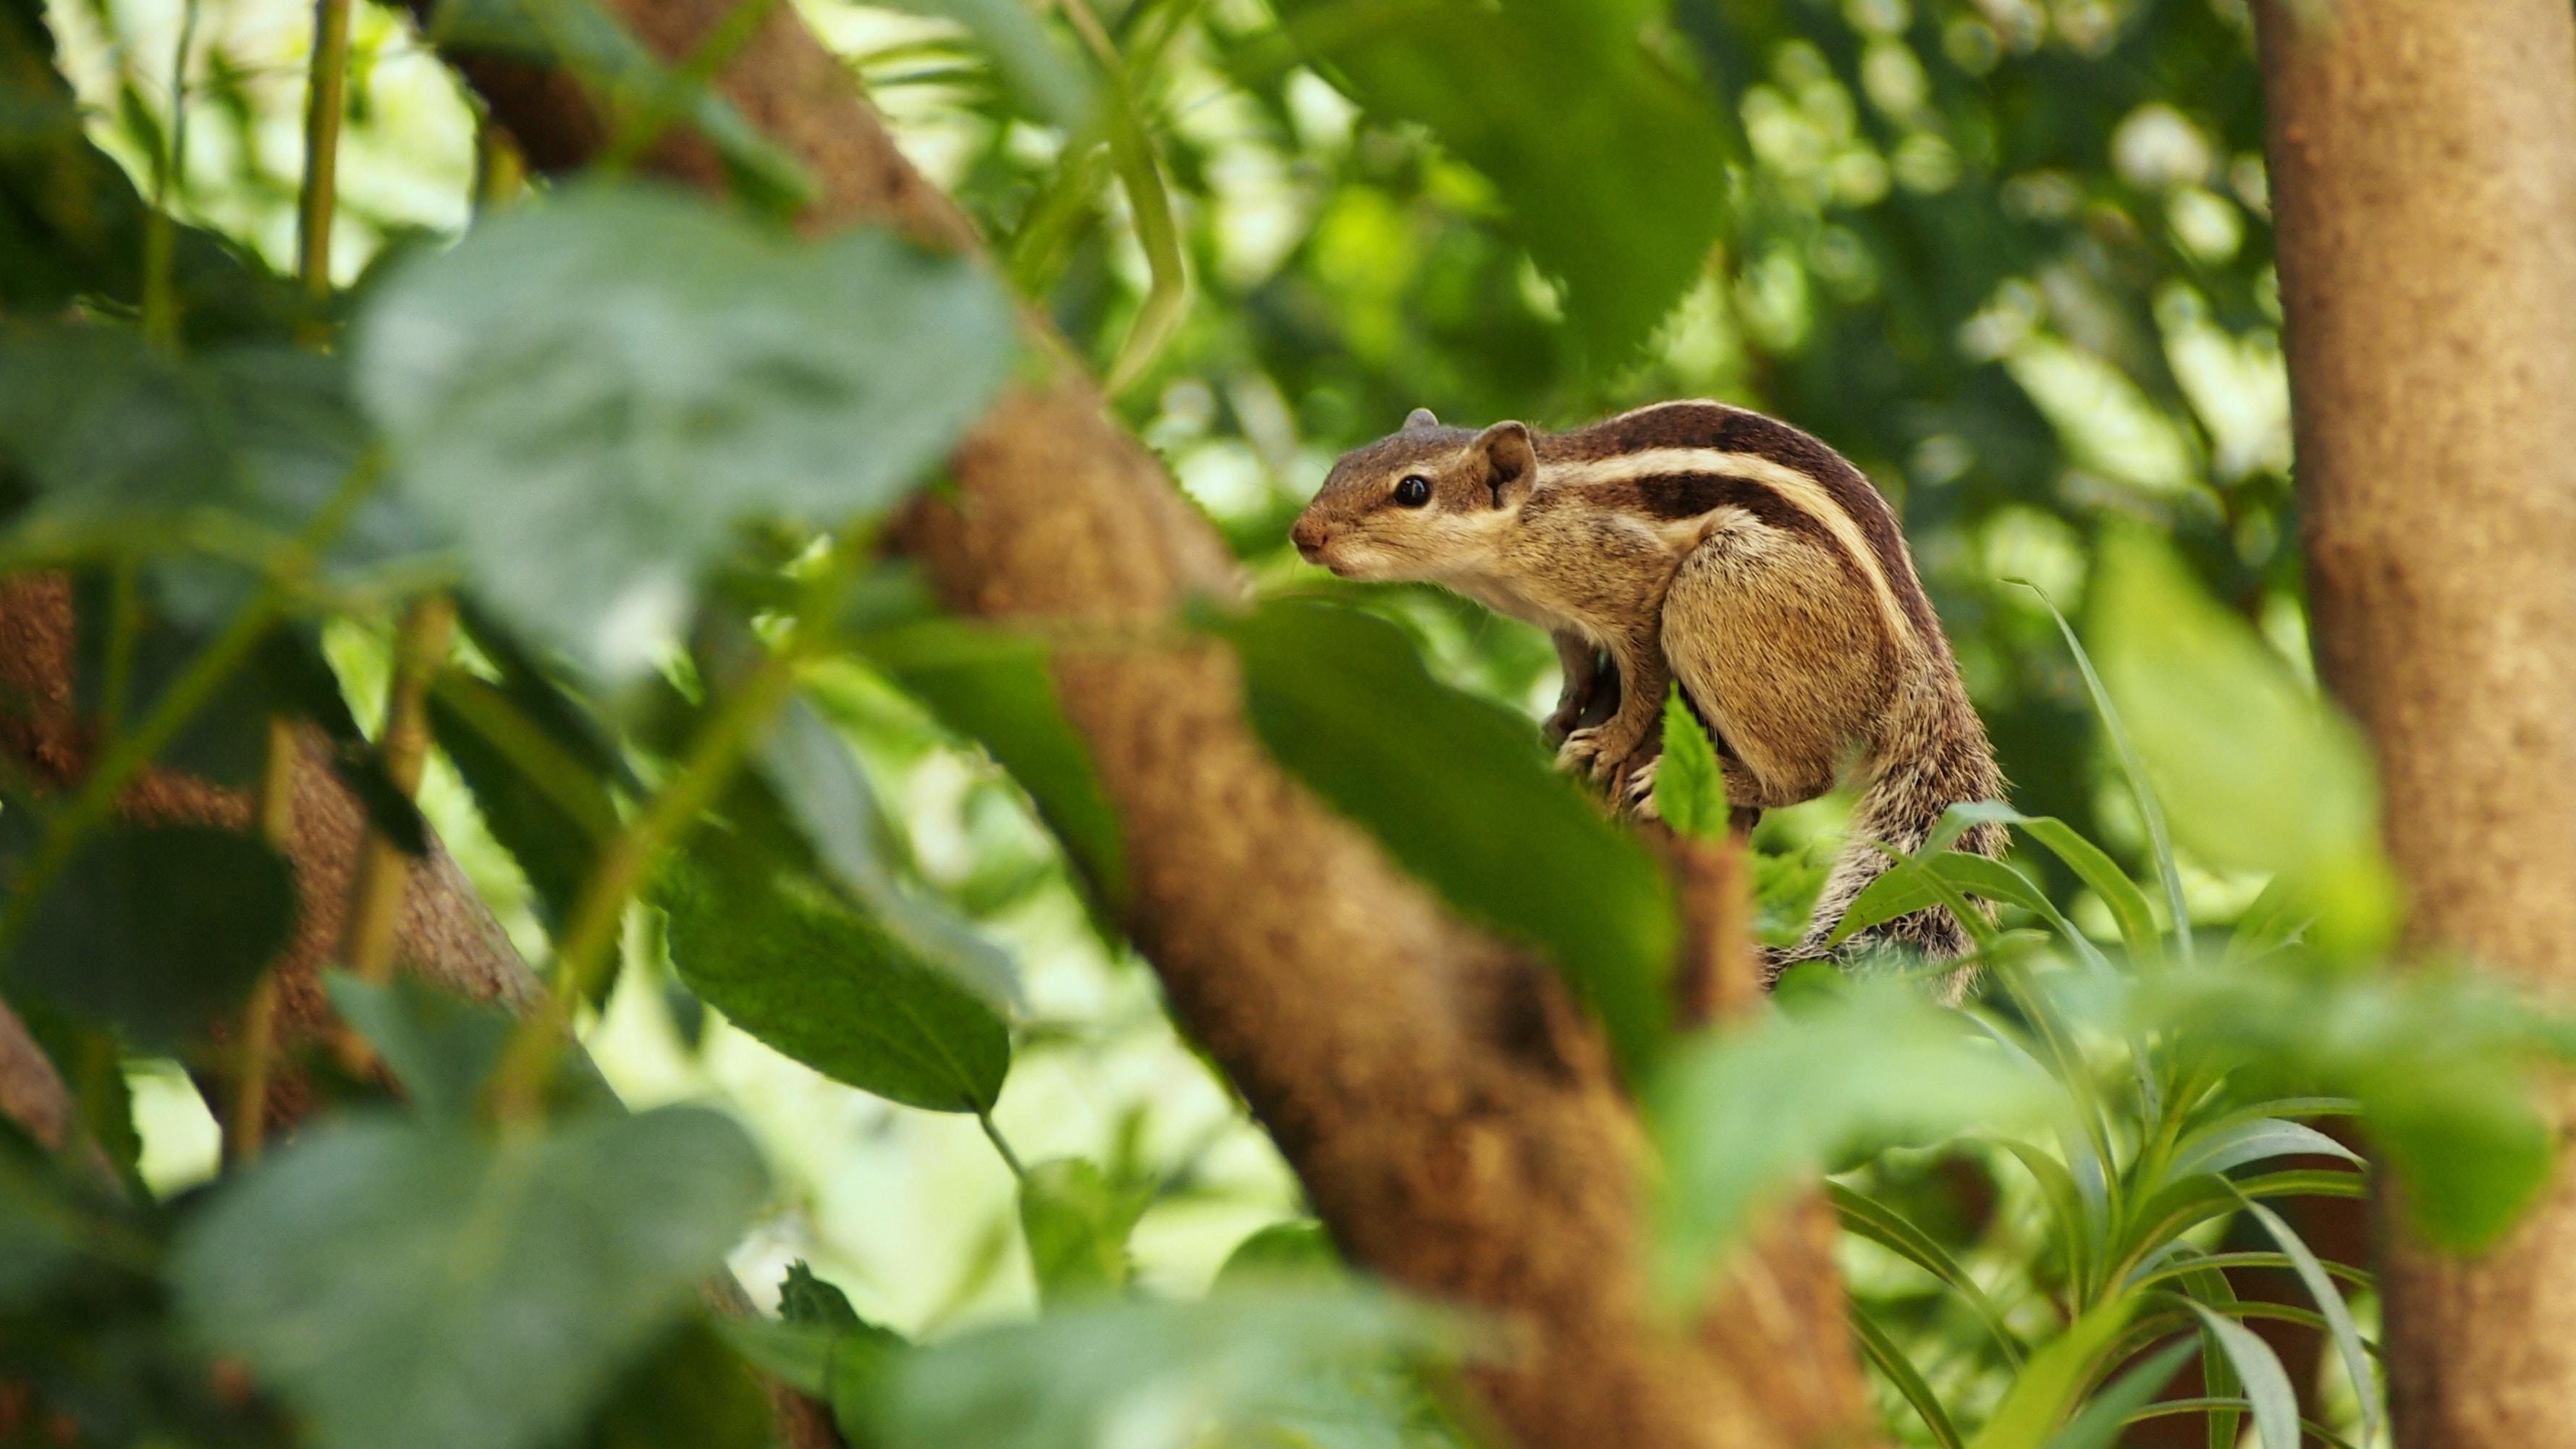 brown chipmunk on branch of tree